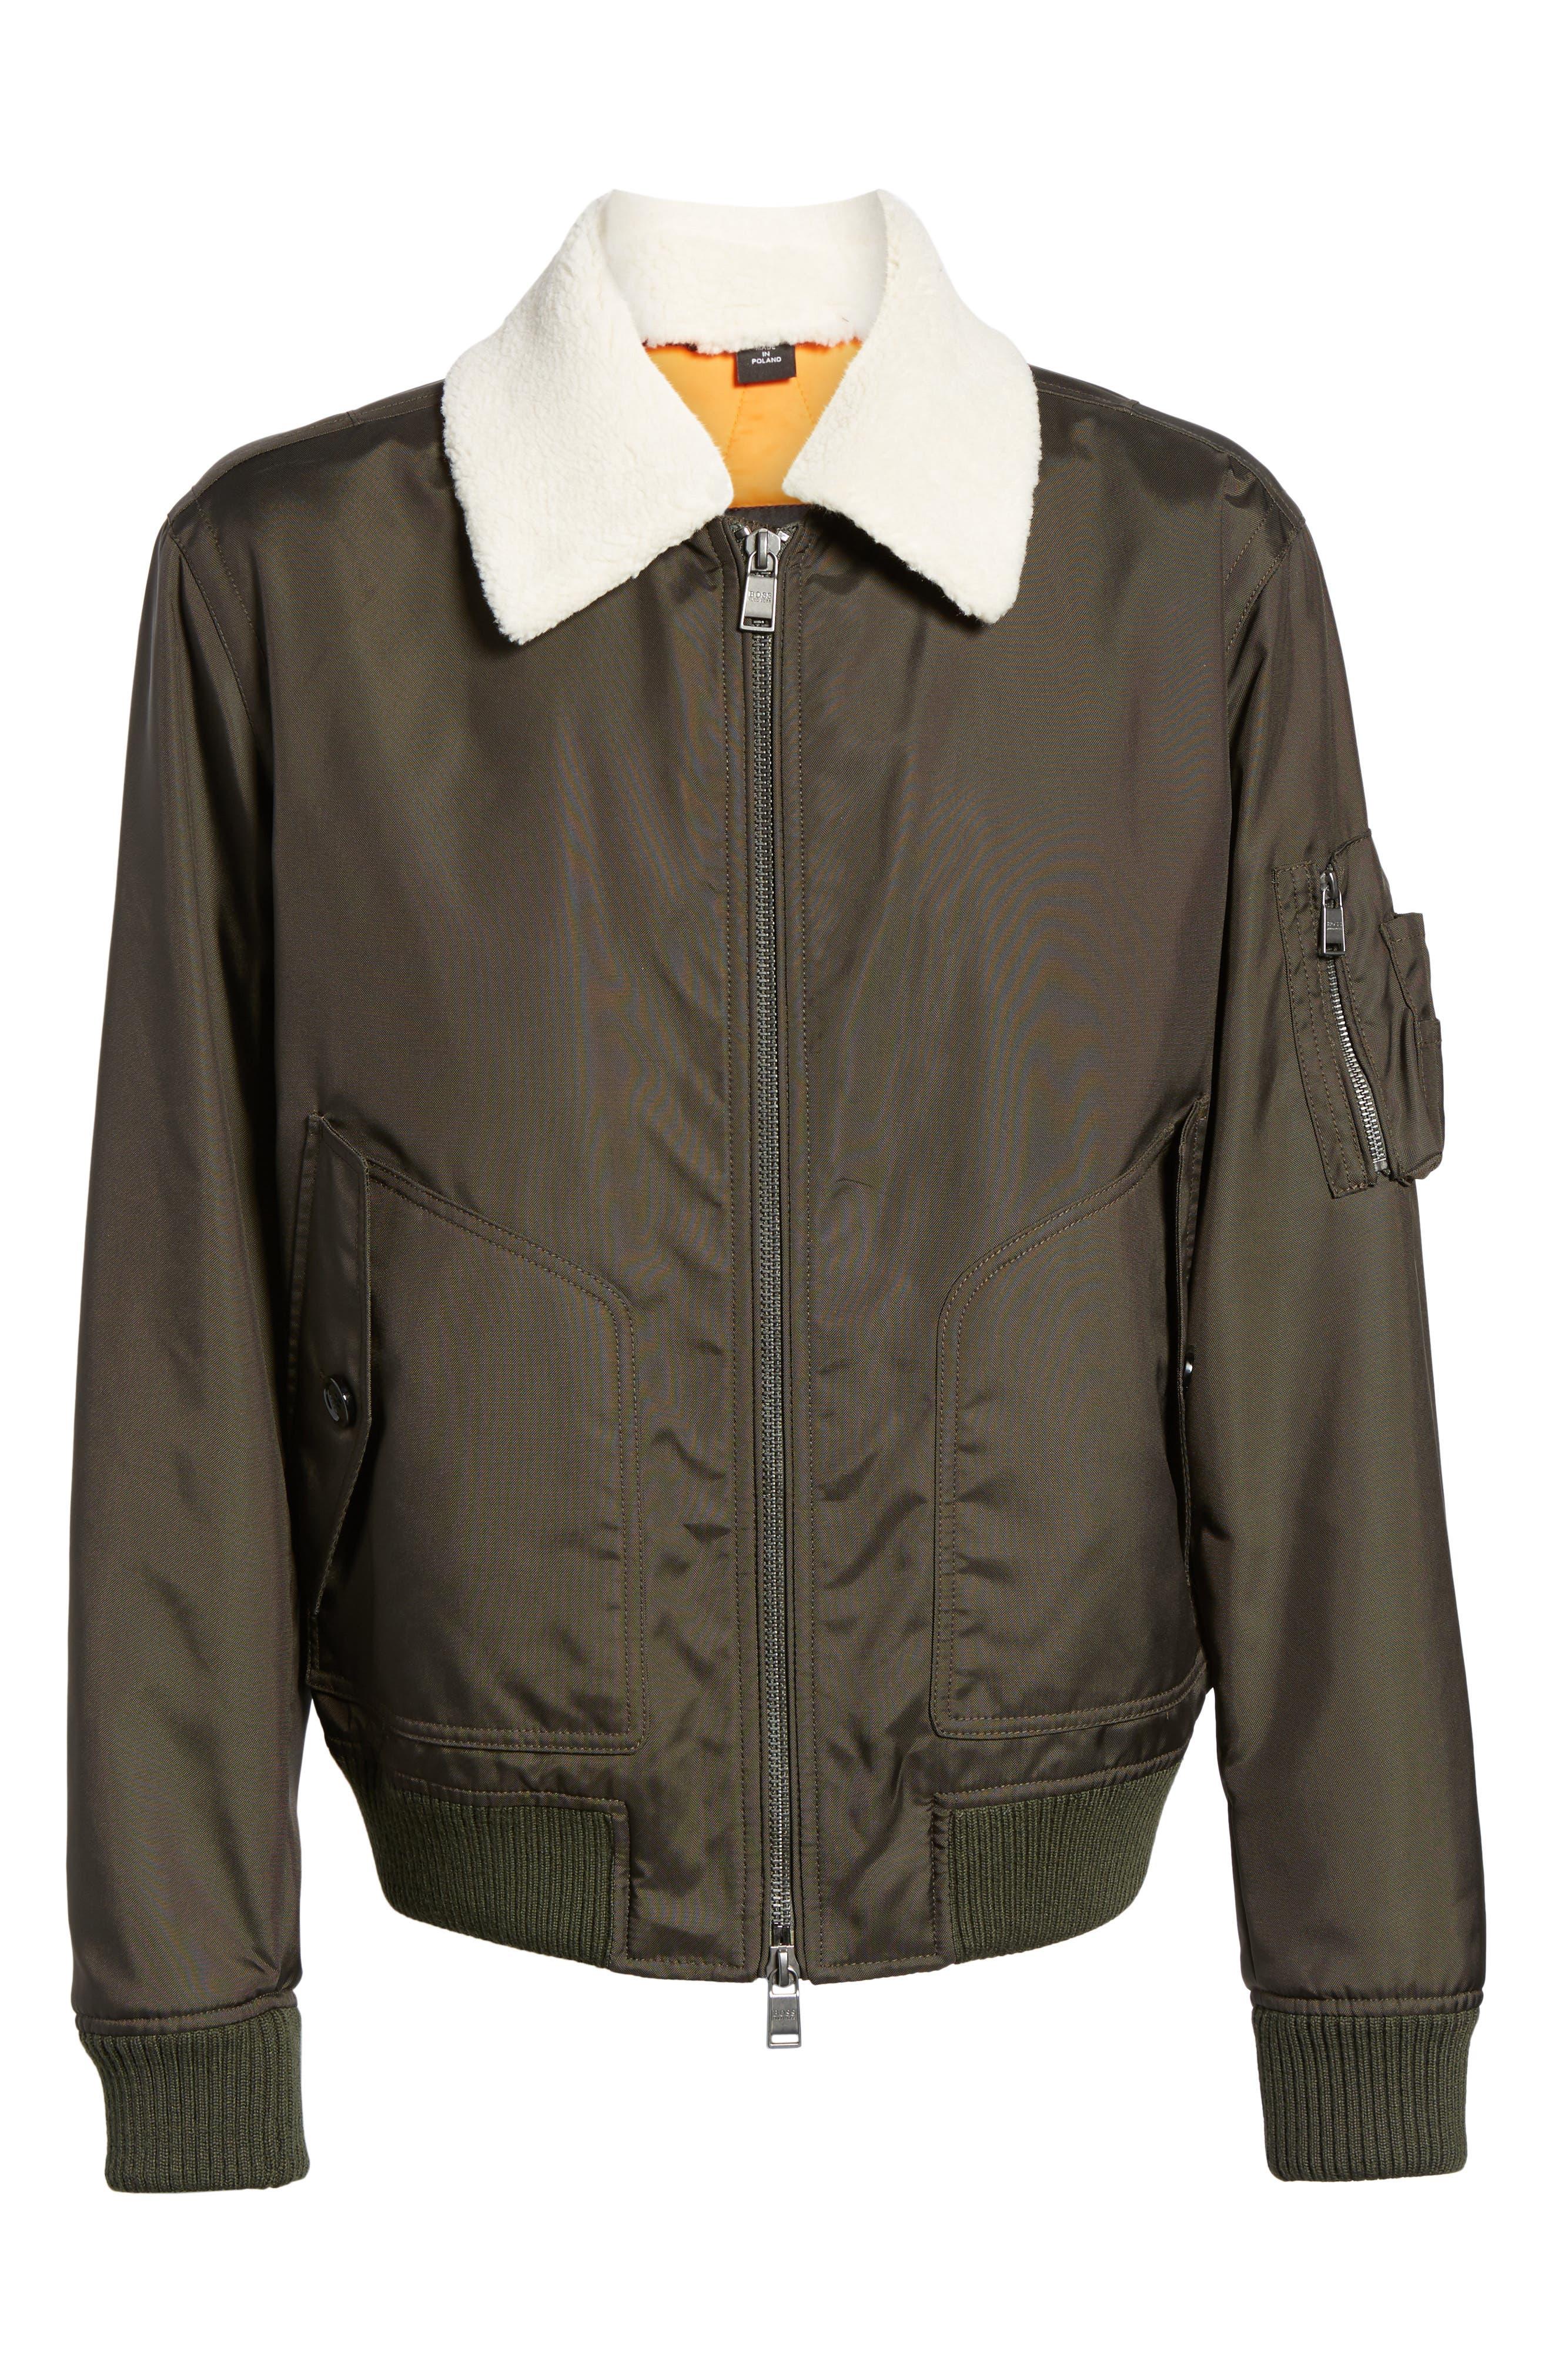 Cobra Aviator Jacket with Faux Fur Collar,                             Alternate thumbnail 5, color,                             342